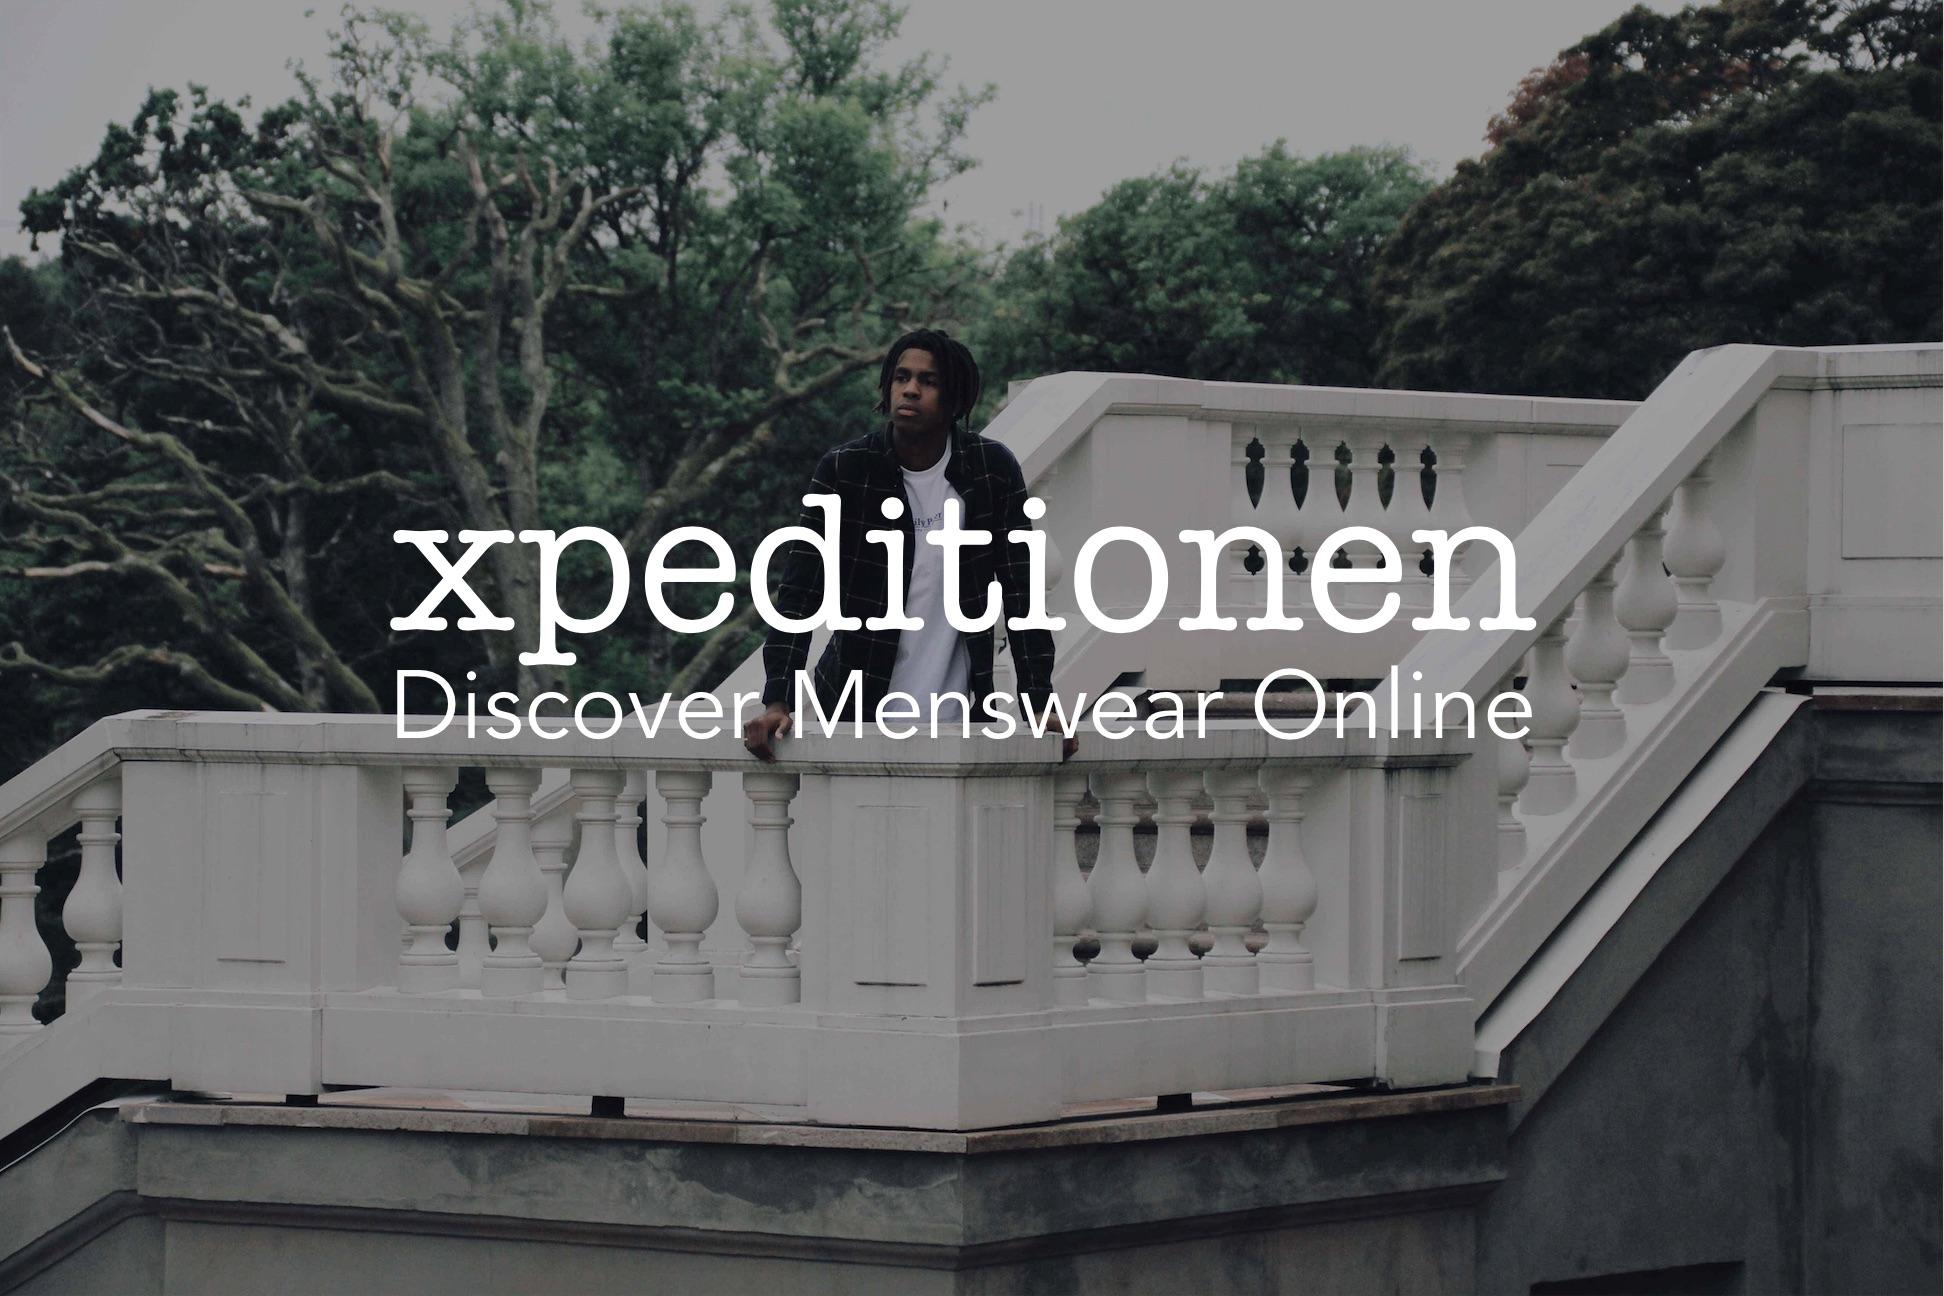 xpeditionen.jpg